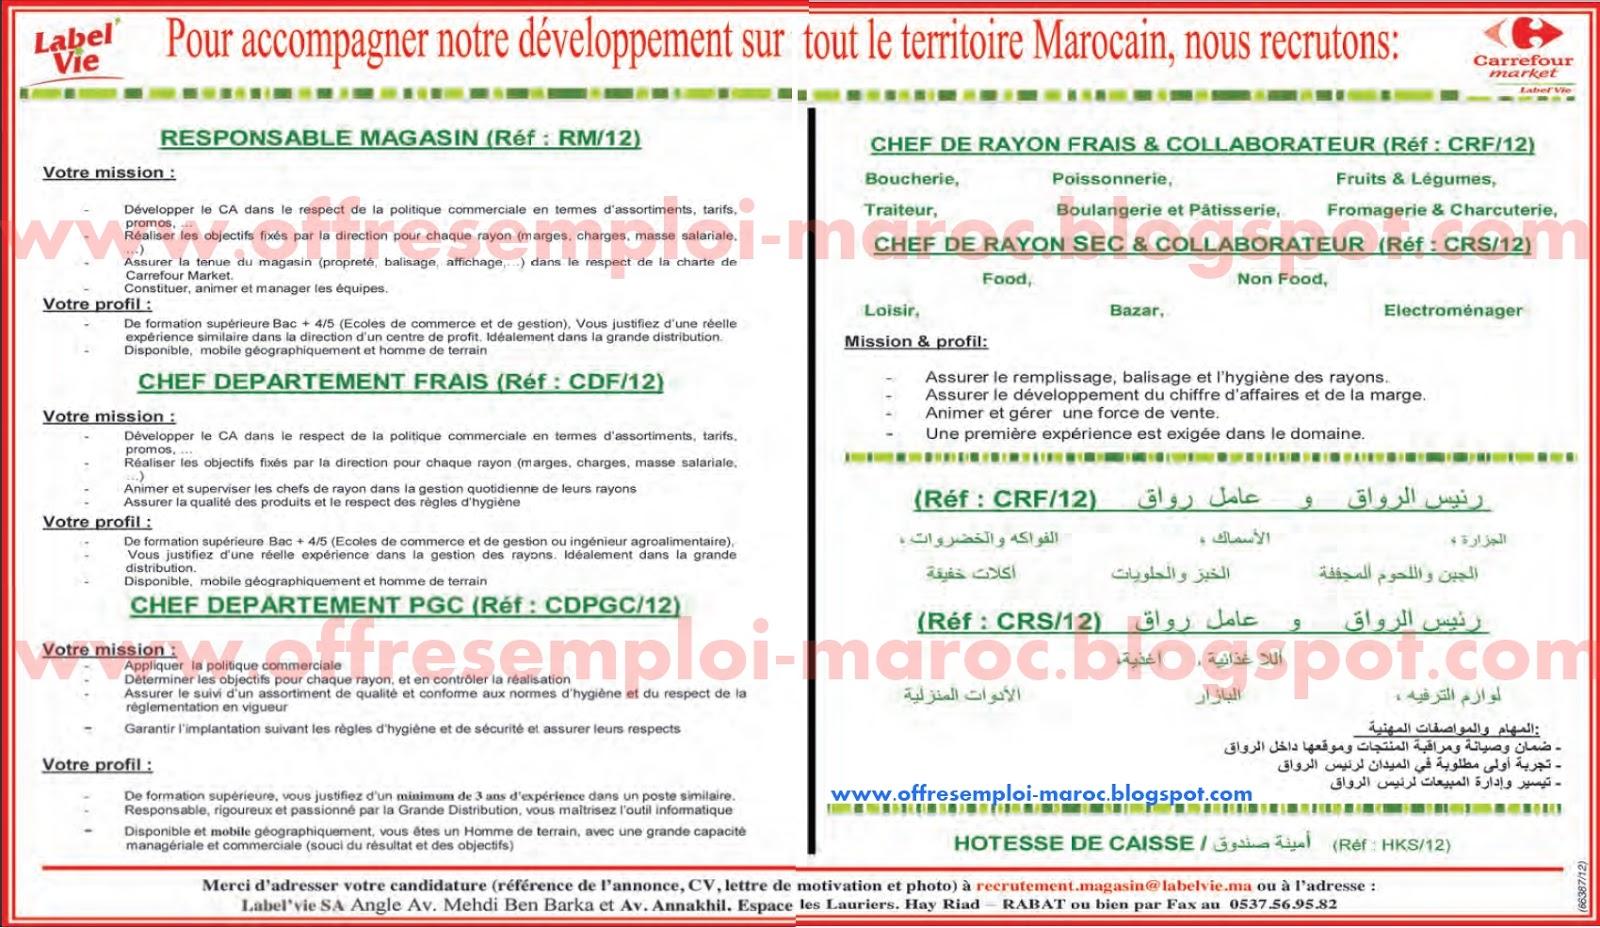 carrefour market - label u0026 39  vie